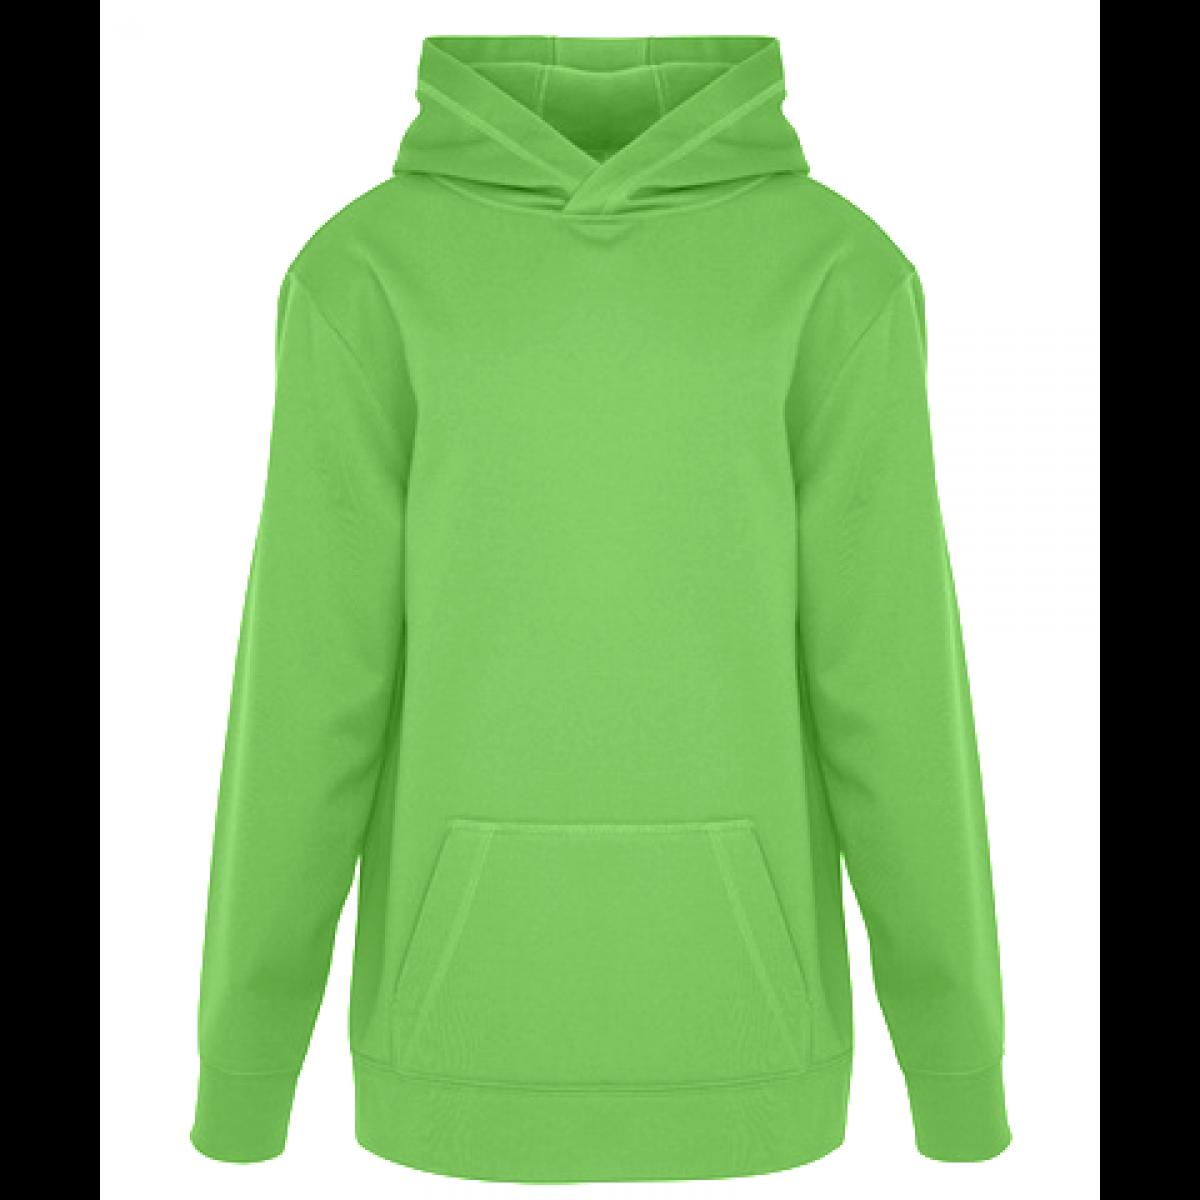 Game Day Fleece Hooded Ladies Sweatshirt-Lime Green-2XL